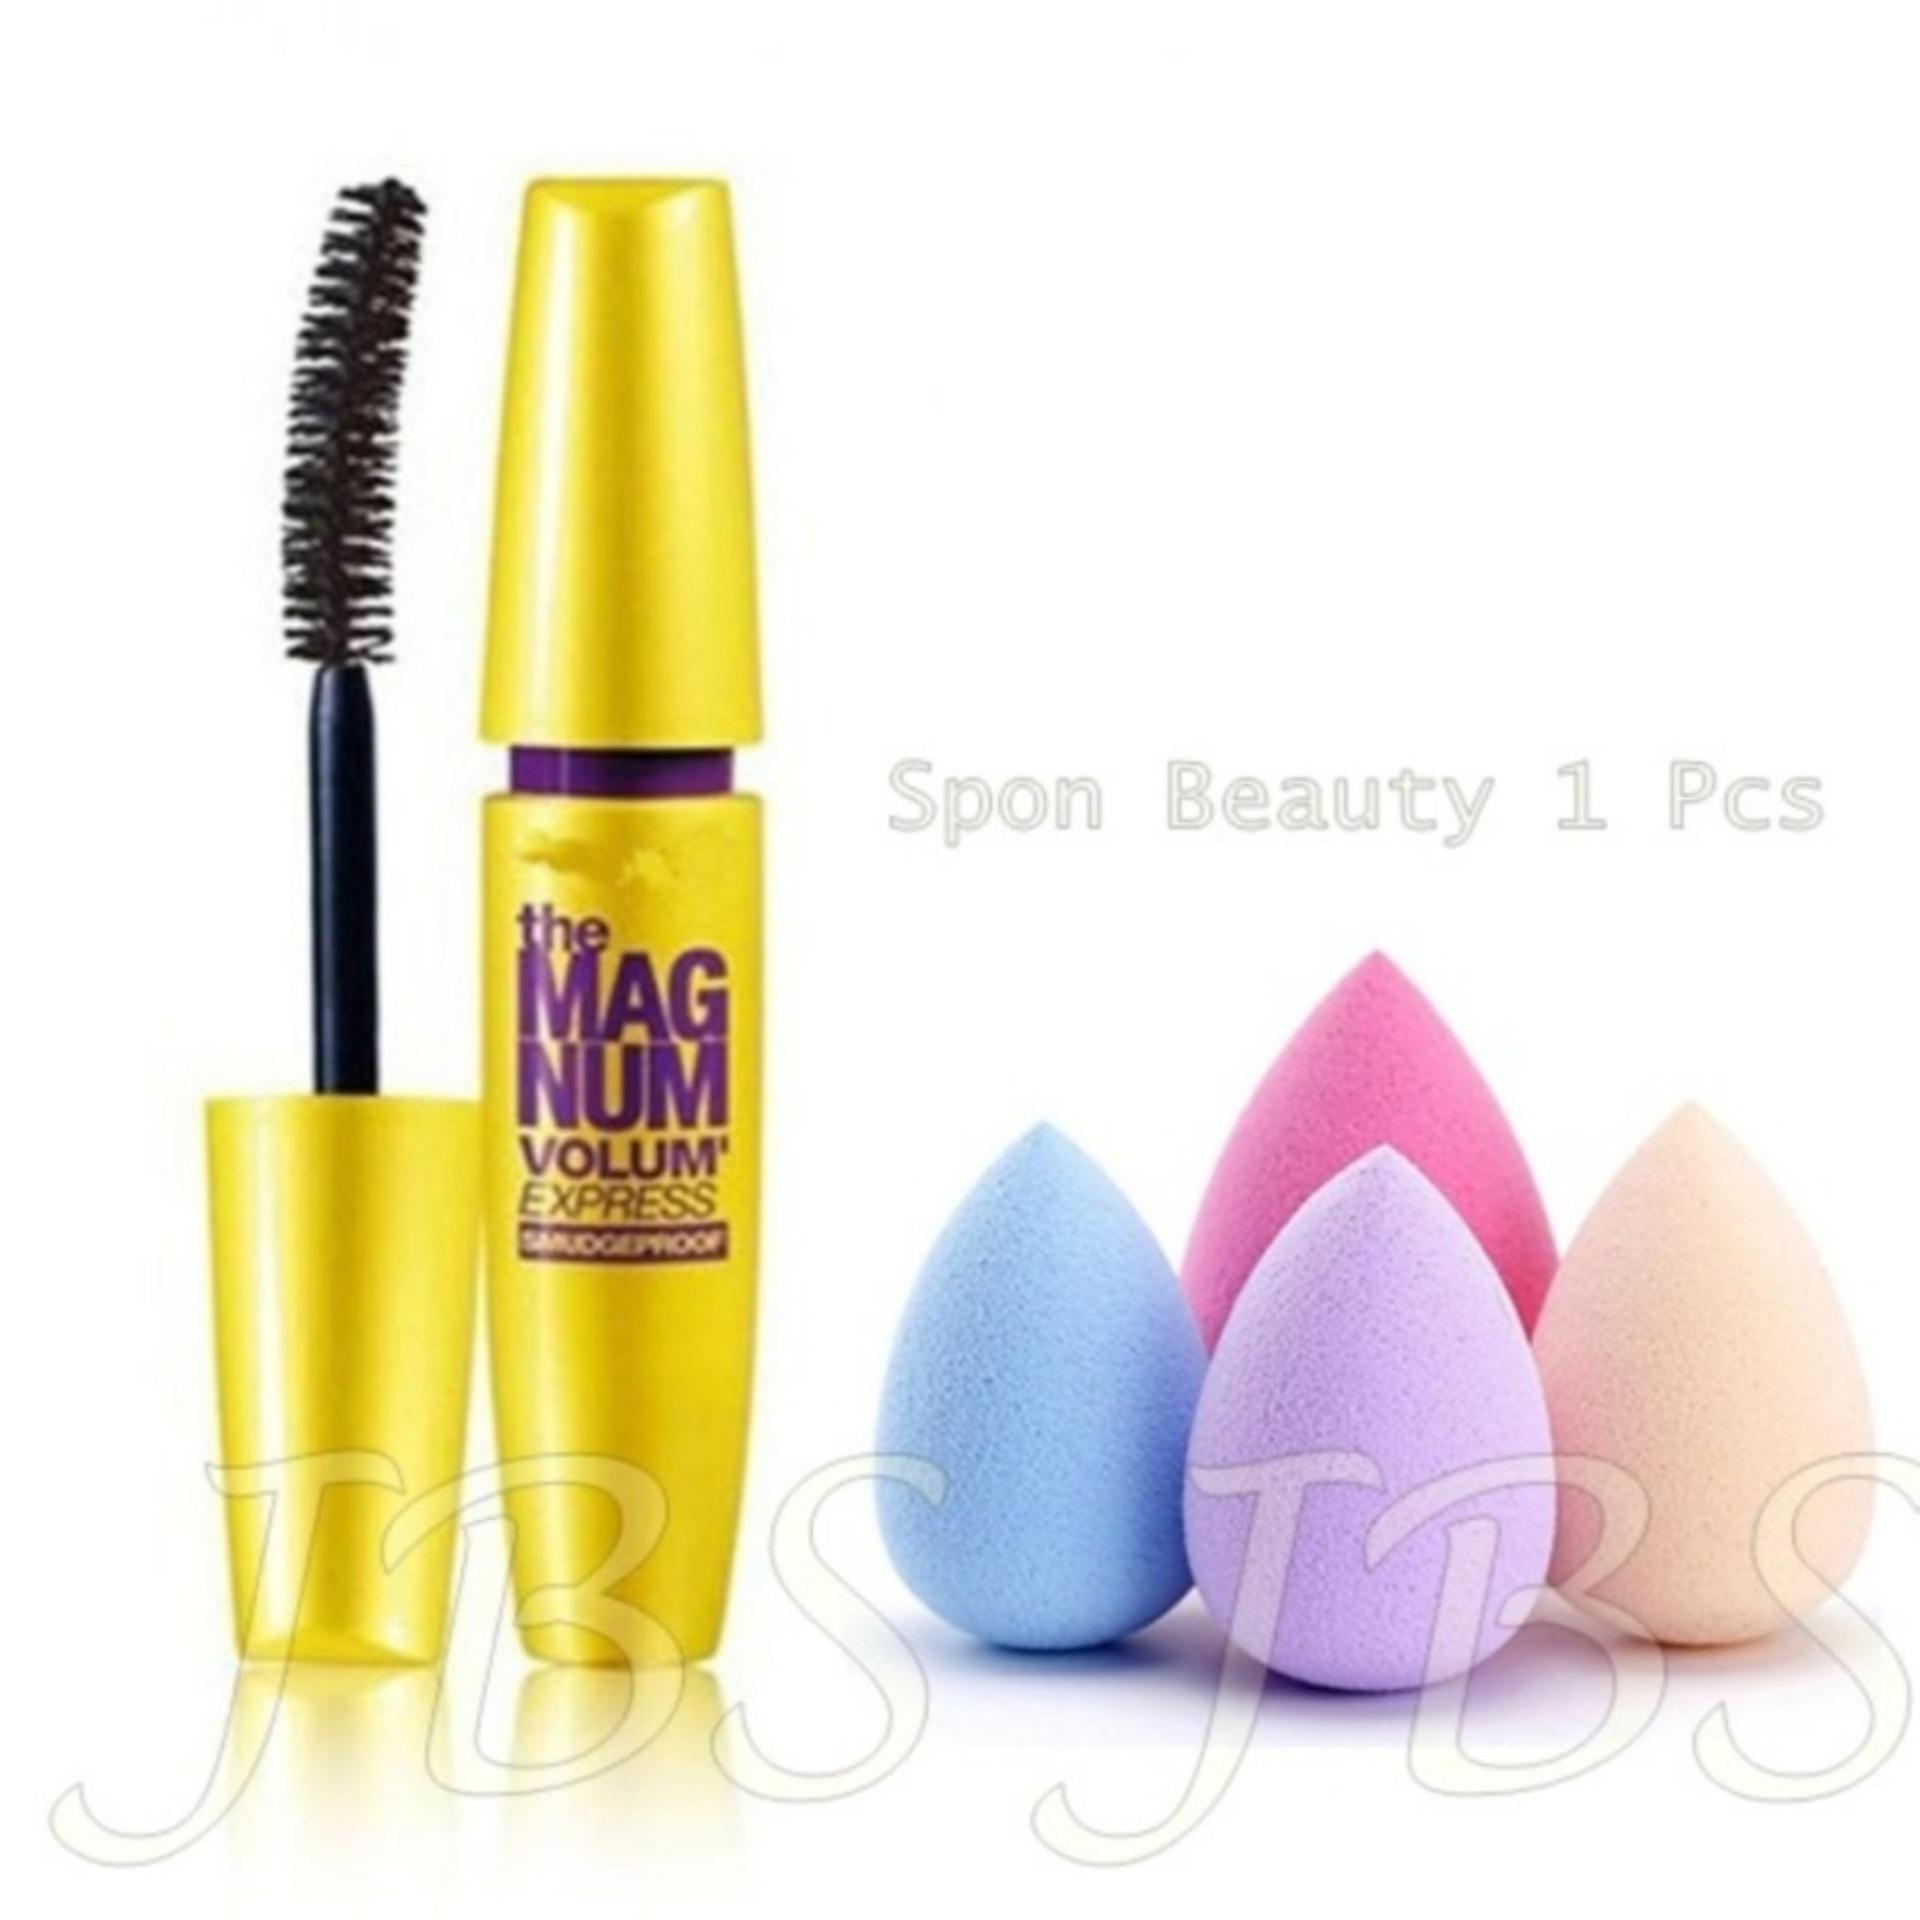 ... MESH Mascara The Fals Lash Volume Express - Mascara Waterproof - Hitam - Spon Beauty Blender